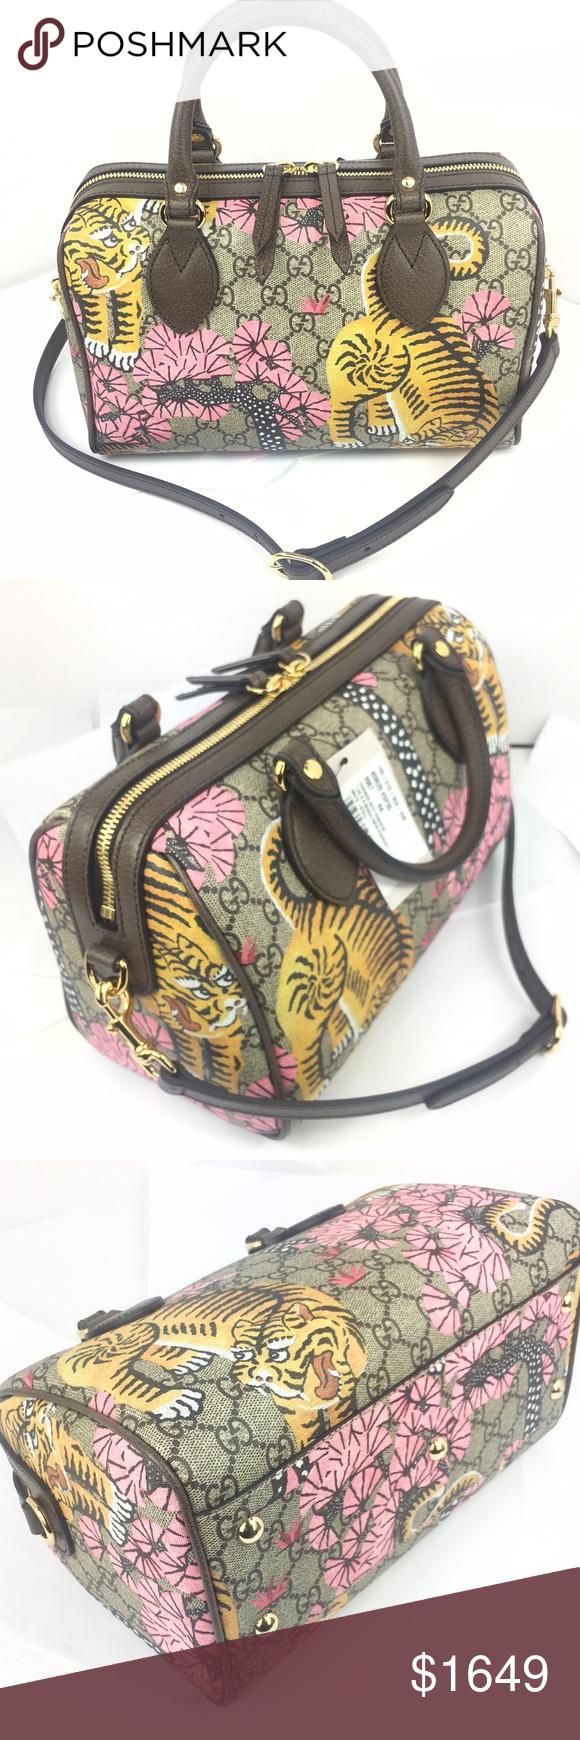 178ab0e3526bc Gucci Bengal Tiger GG Supreme Boston Bag  449661 - Bengal Tiger Print on GG  Supreme